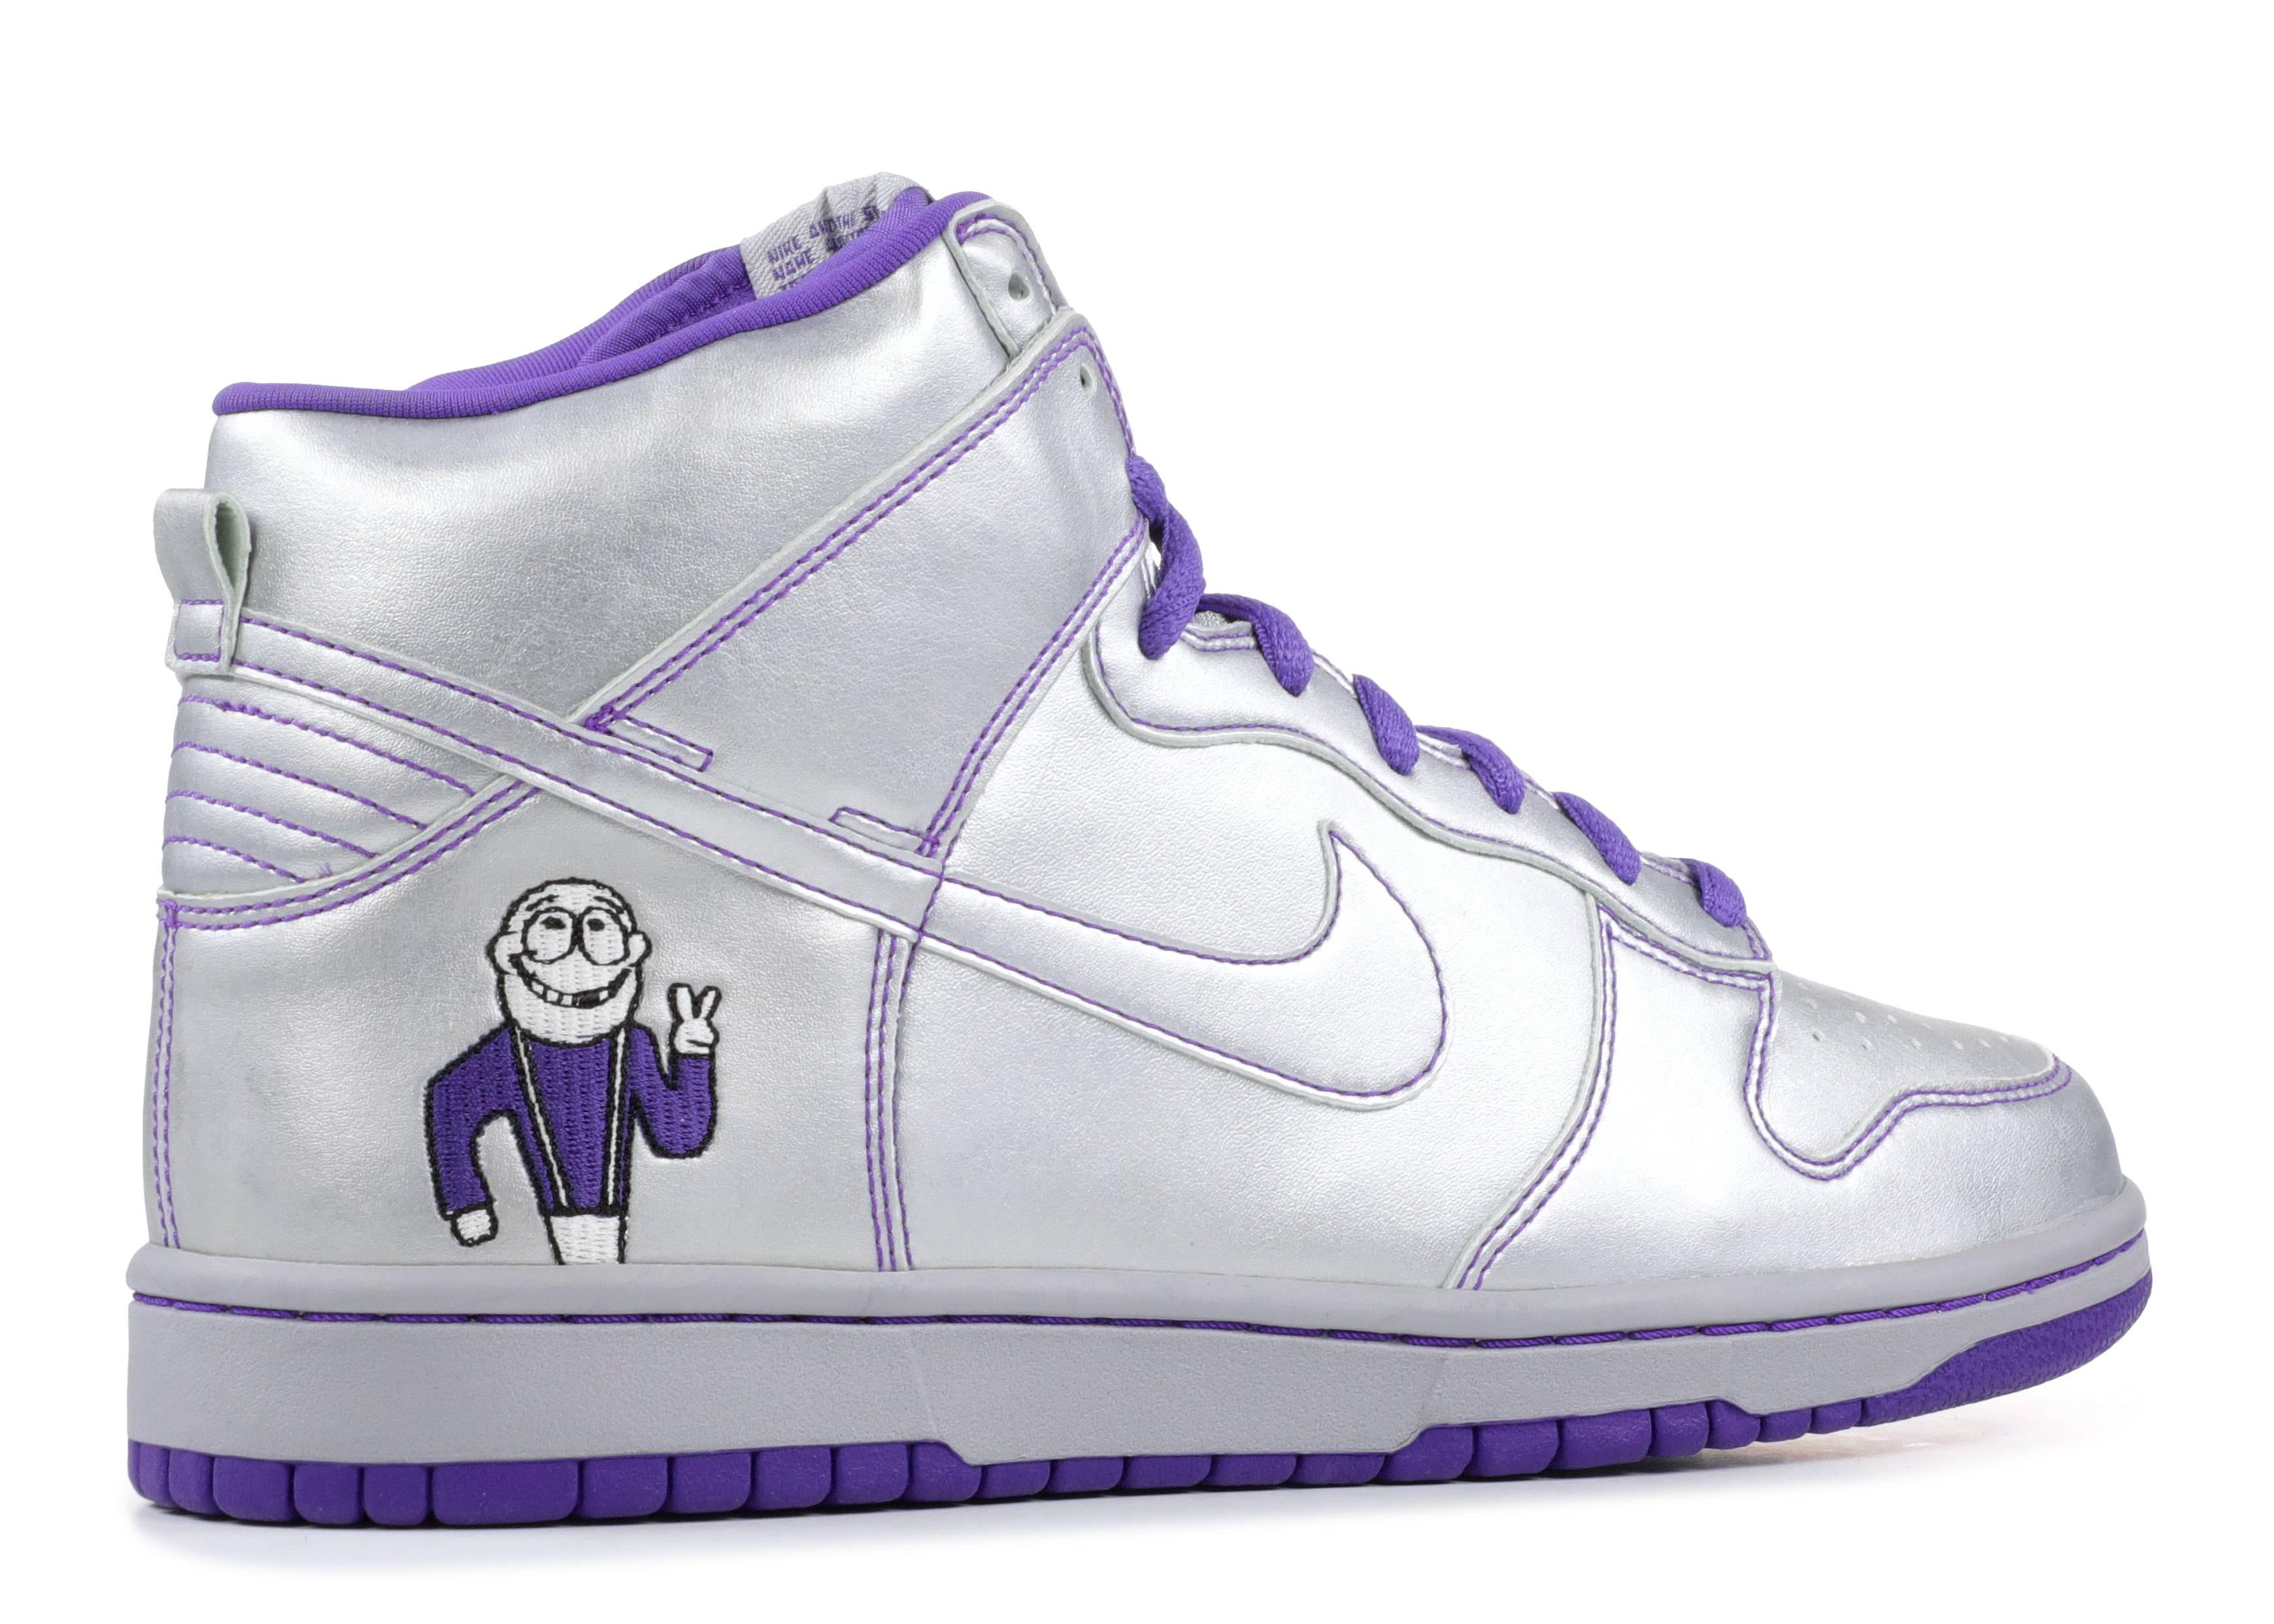 Dunk High Premium SB 'Dinosaur Jr' - Nike - 313171 003 - metallic ...